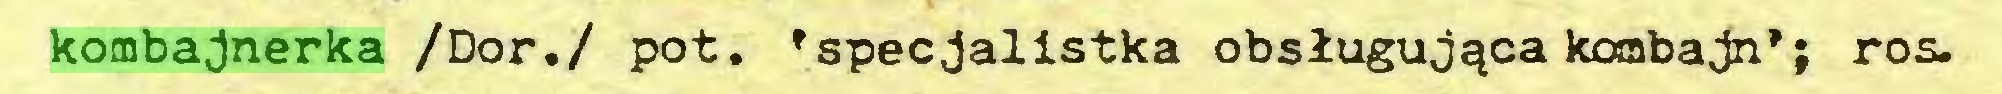 (...) kombajnerka /Dor./ pot. 'specjalistka obsługująca kombajn*; ros...